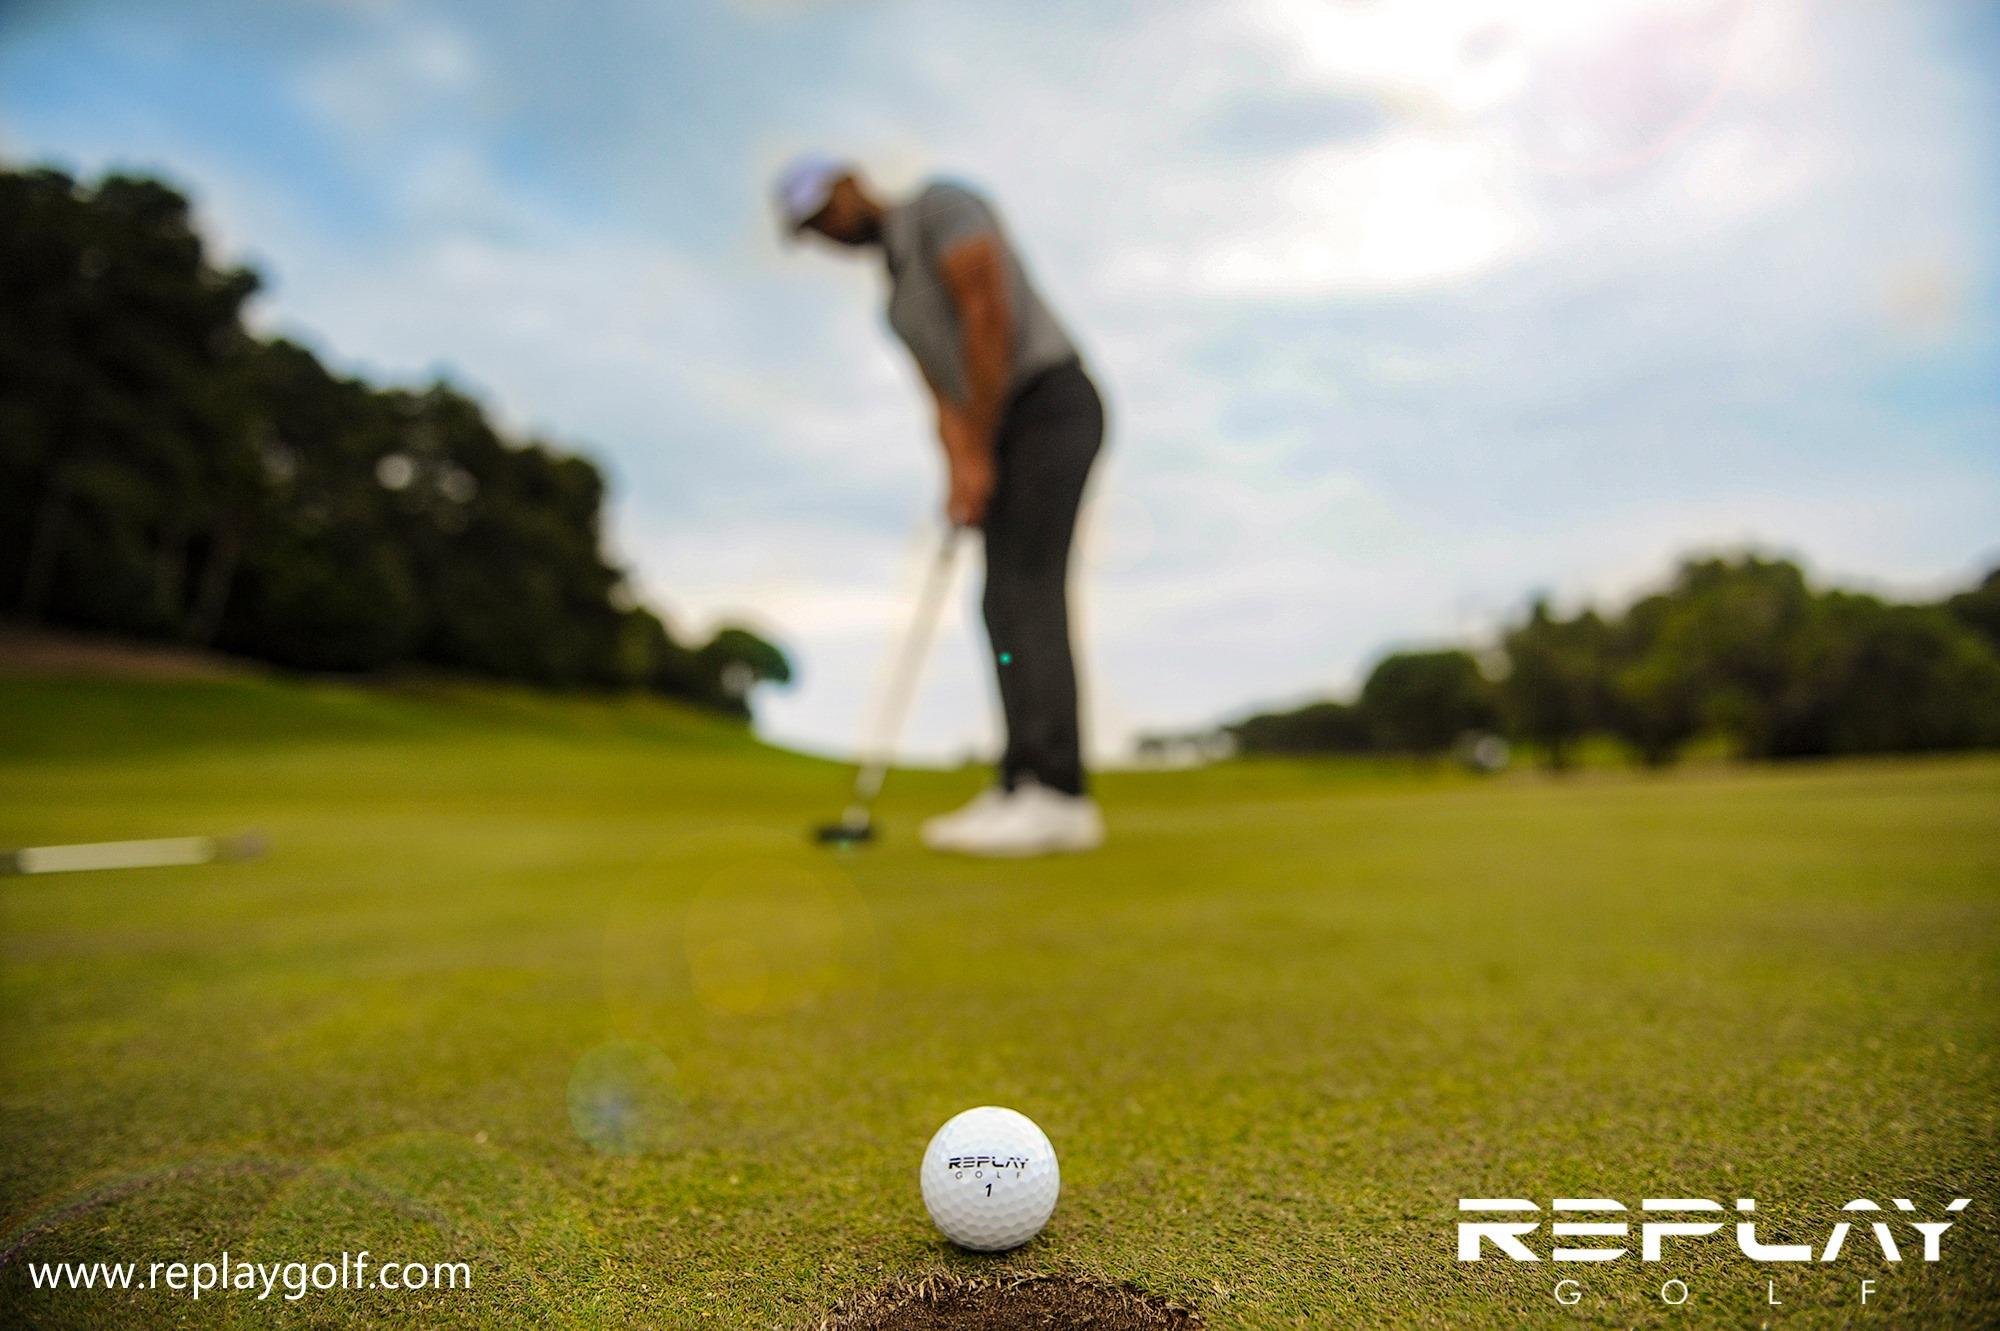 new-golf-balls-or-range-golf-balls